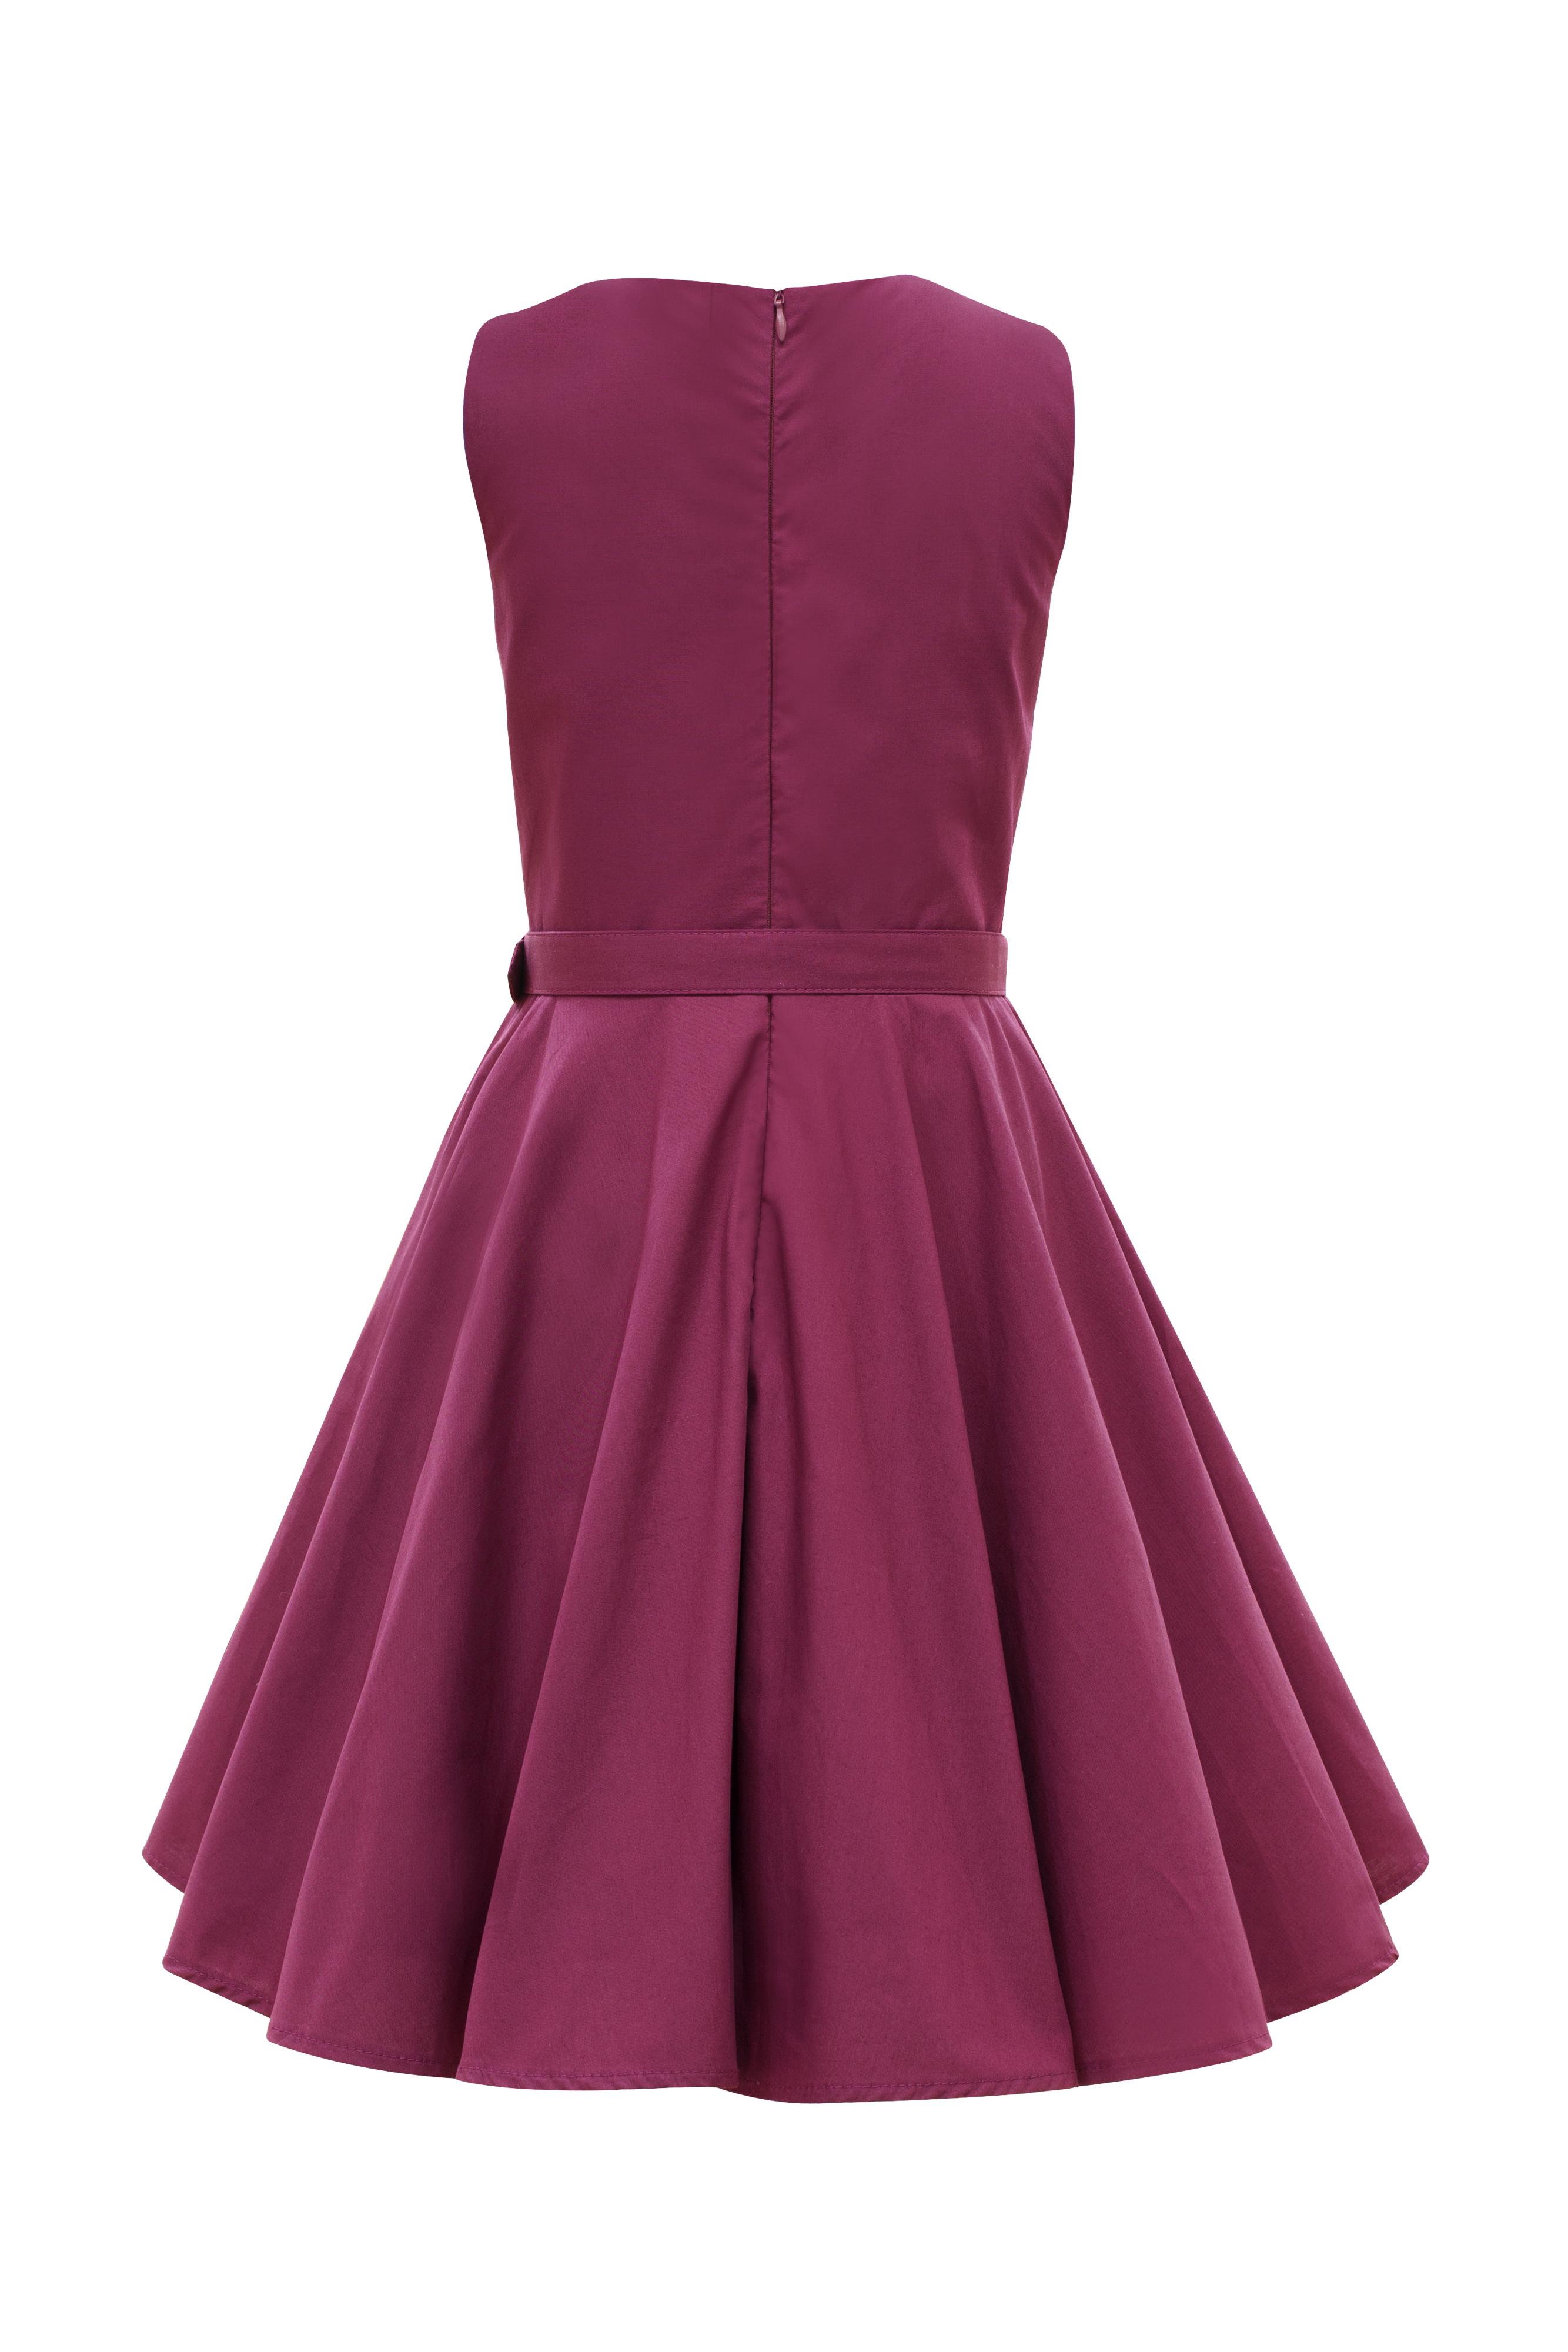 Kids \'Audrey\' Vintage Clarity 50\'s Party Girls Prom Dress | eBay